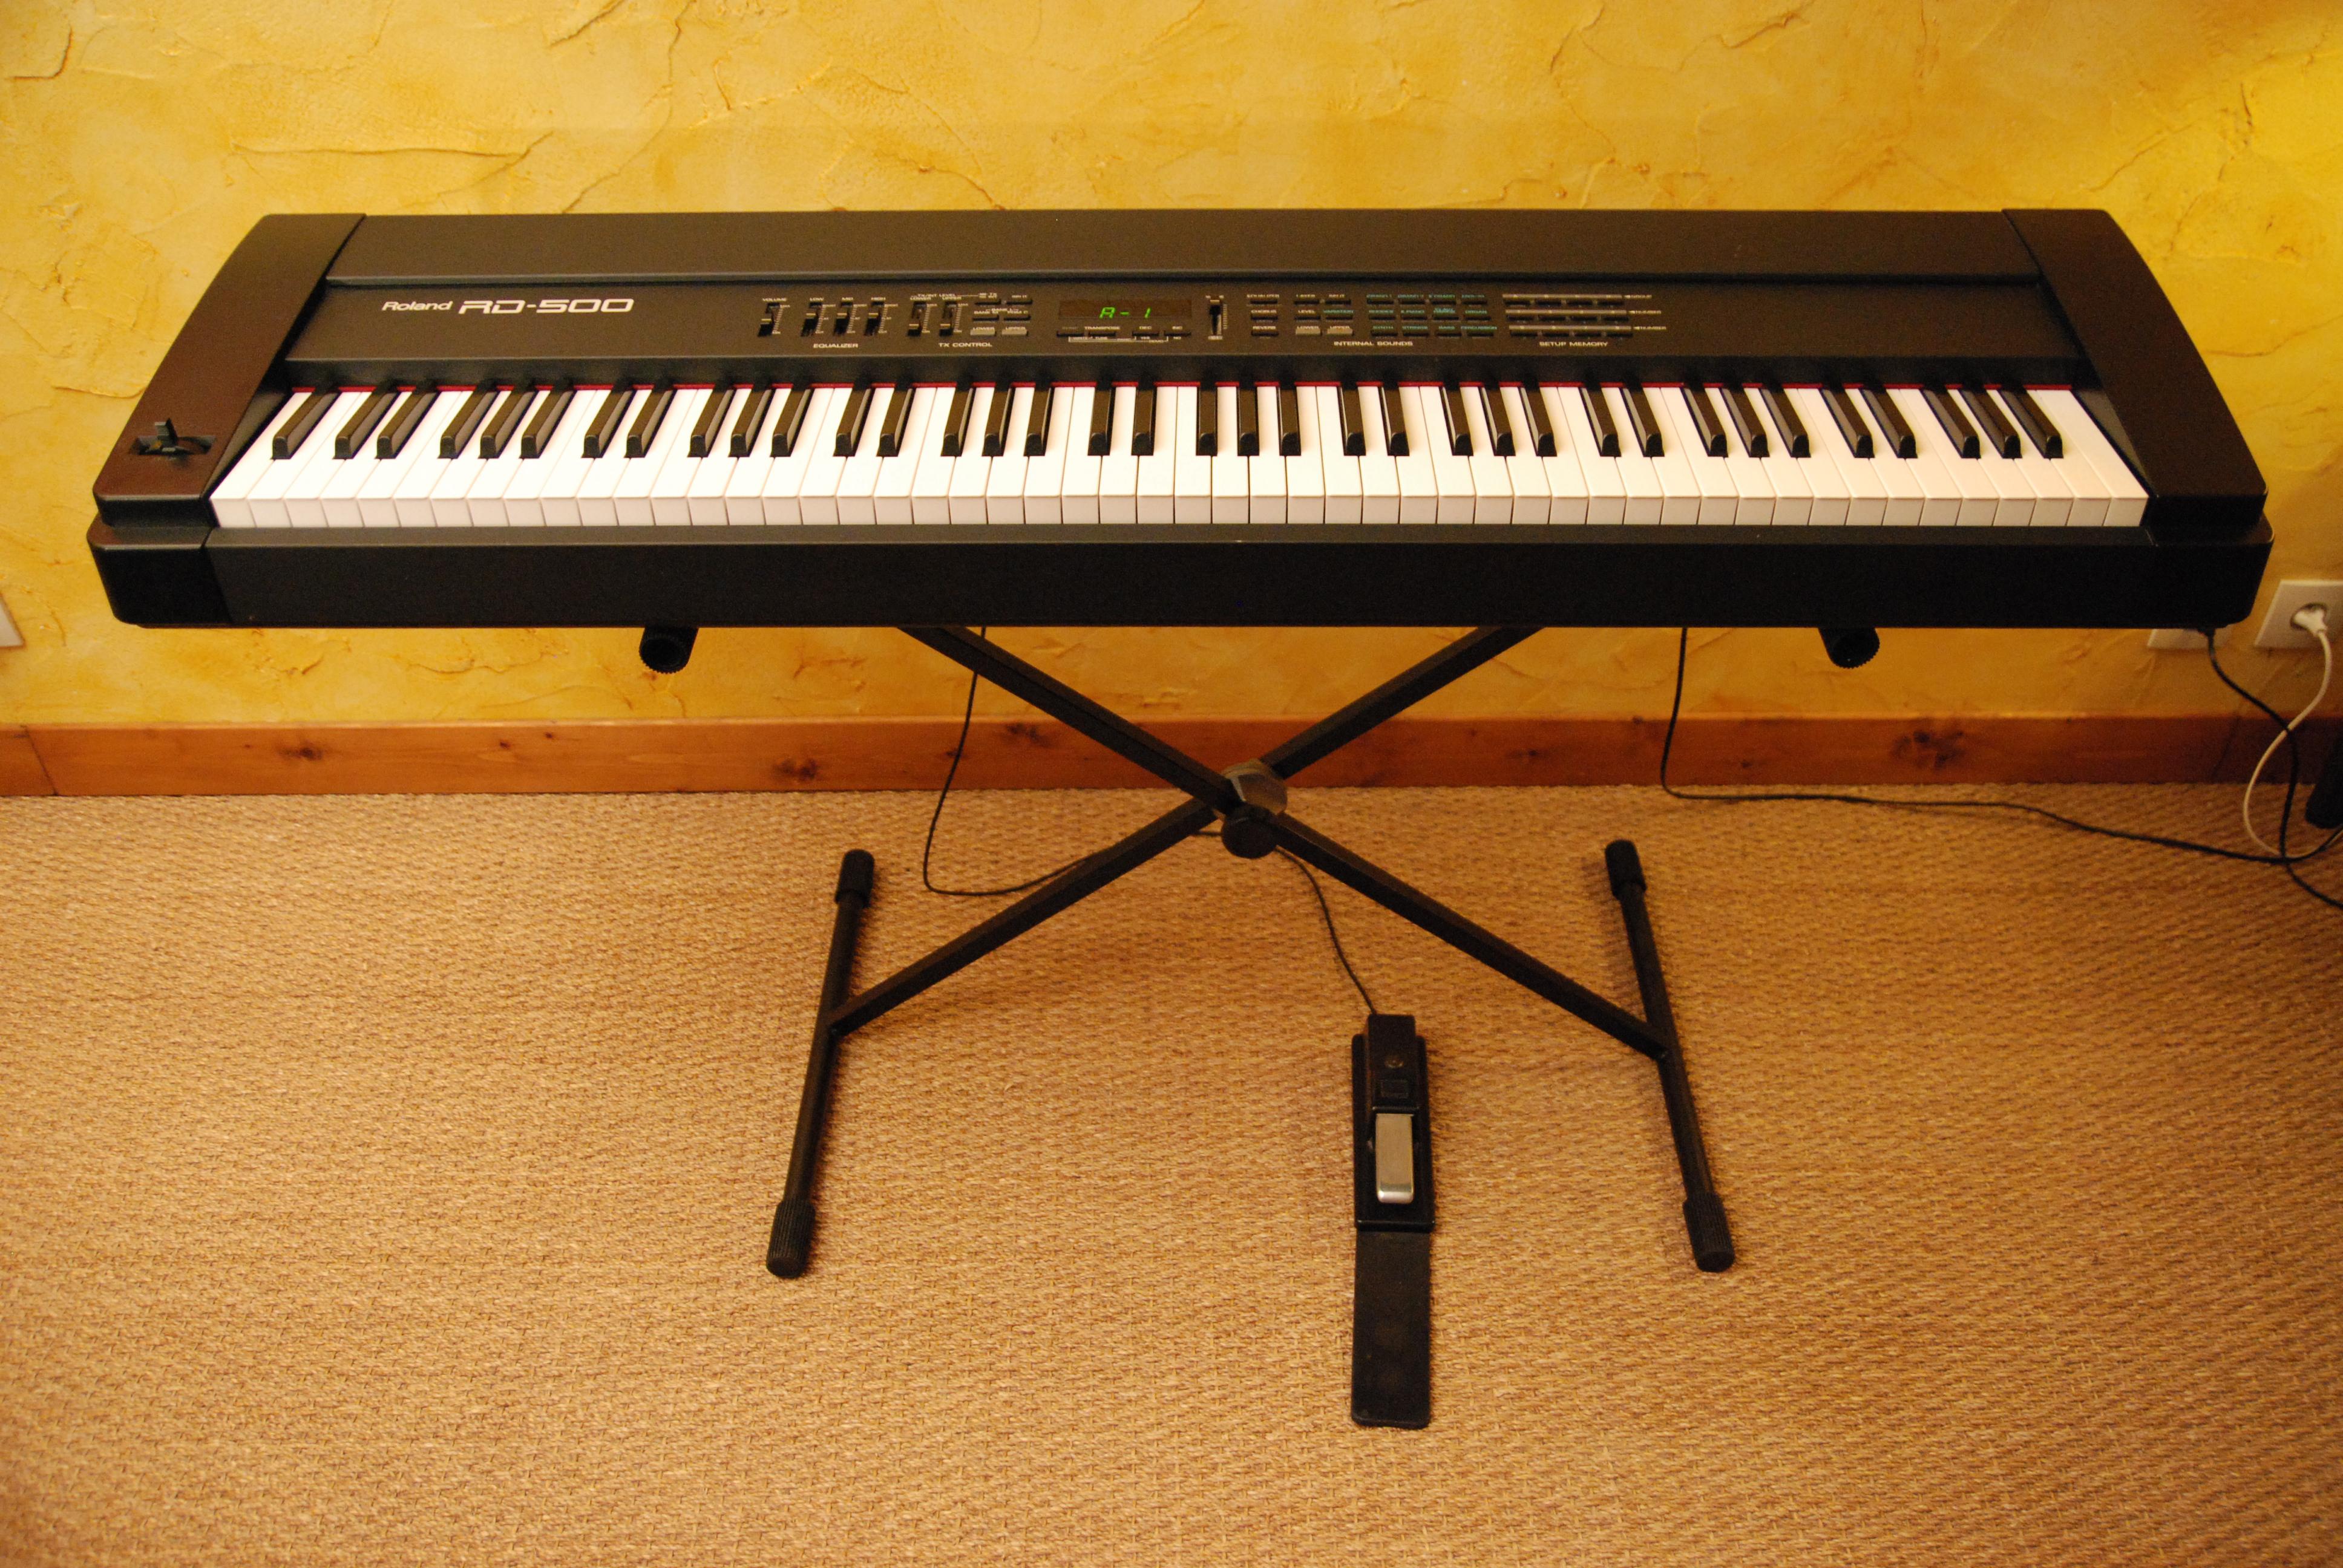 Piano Digital Roland Rd 500 : roland rd 500 image 349562 audiofanzine ~ Vivirlamusica.com Haus und Dekorationen